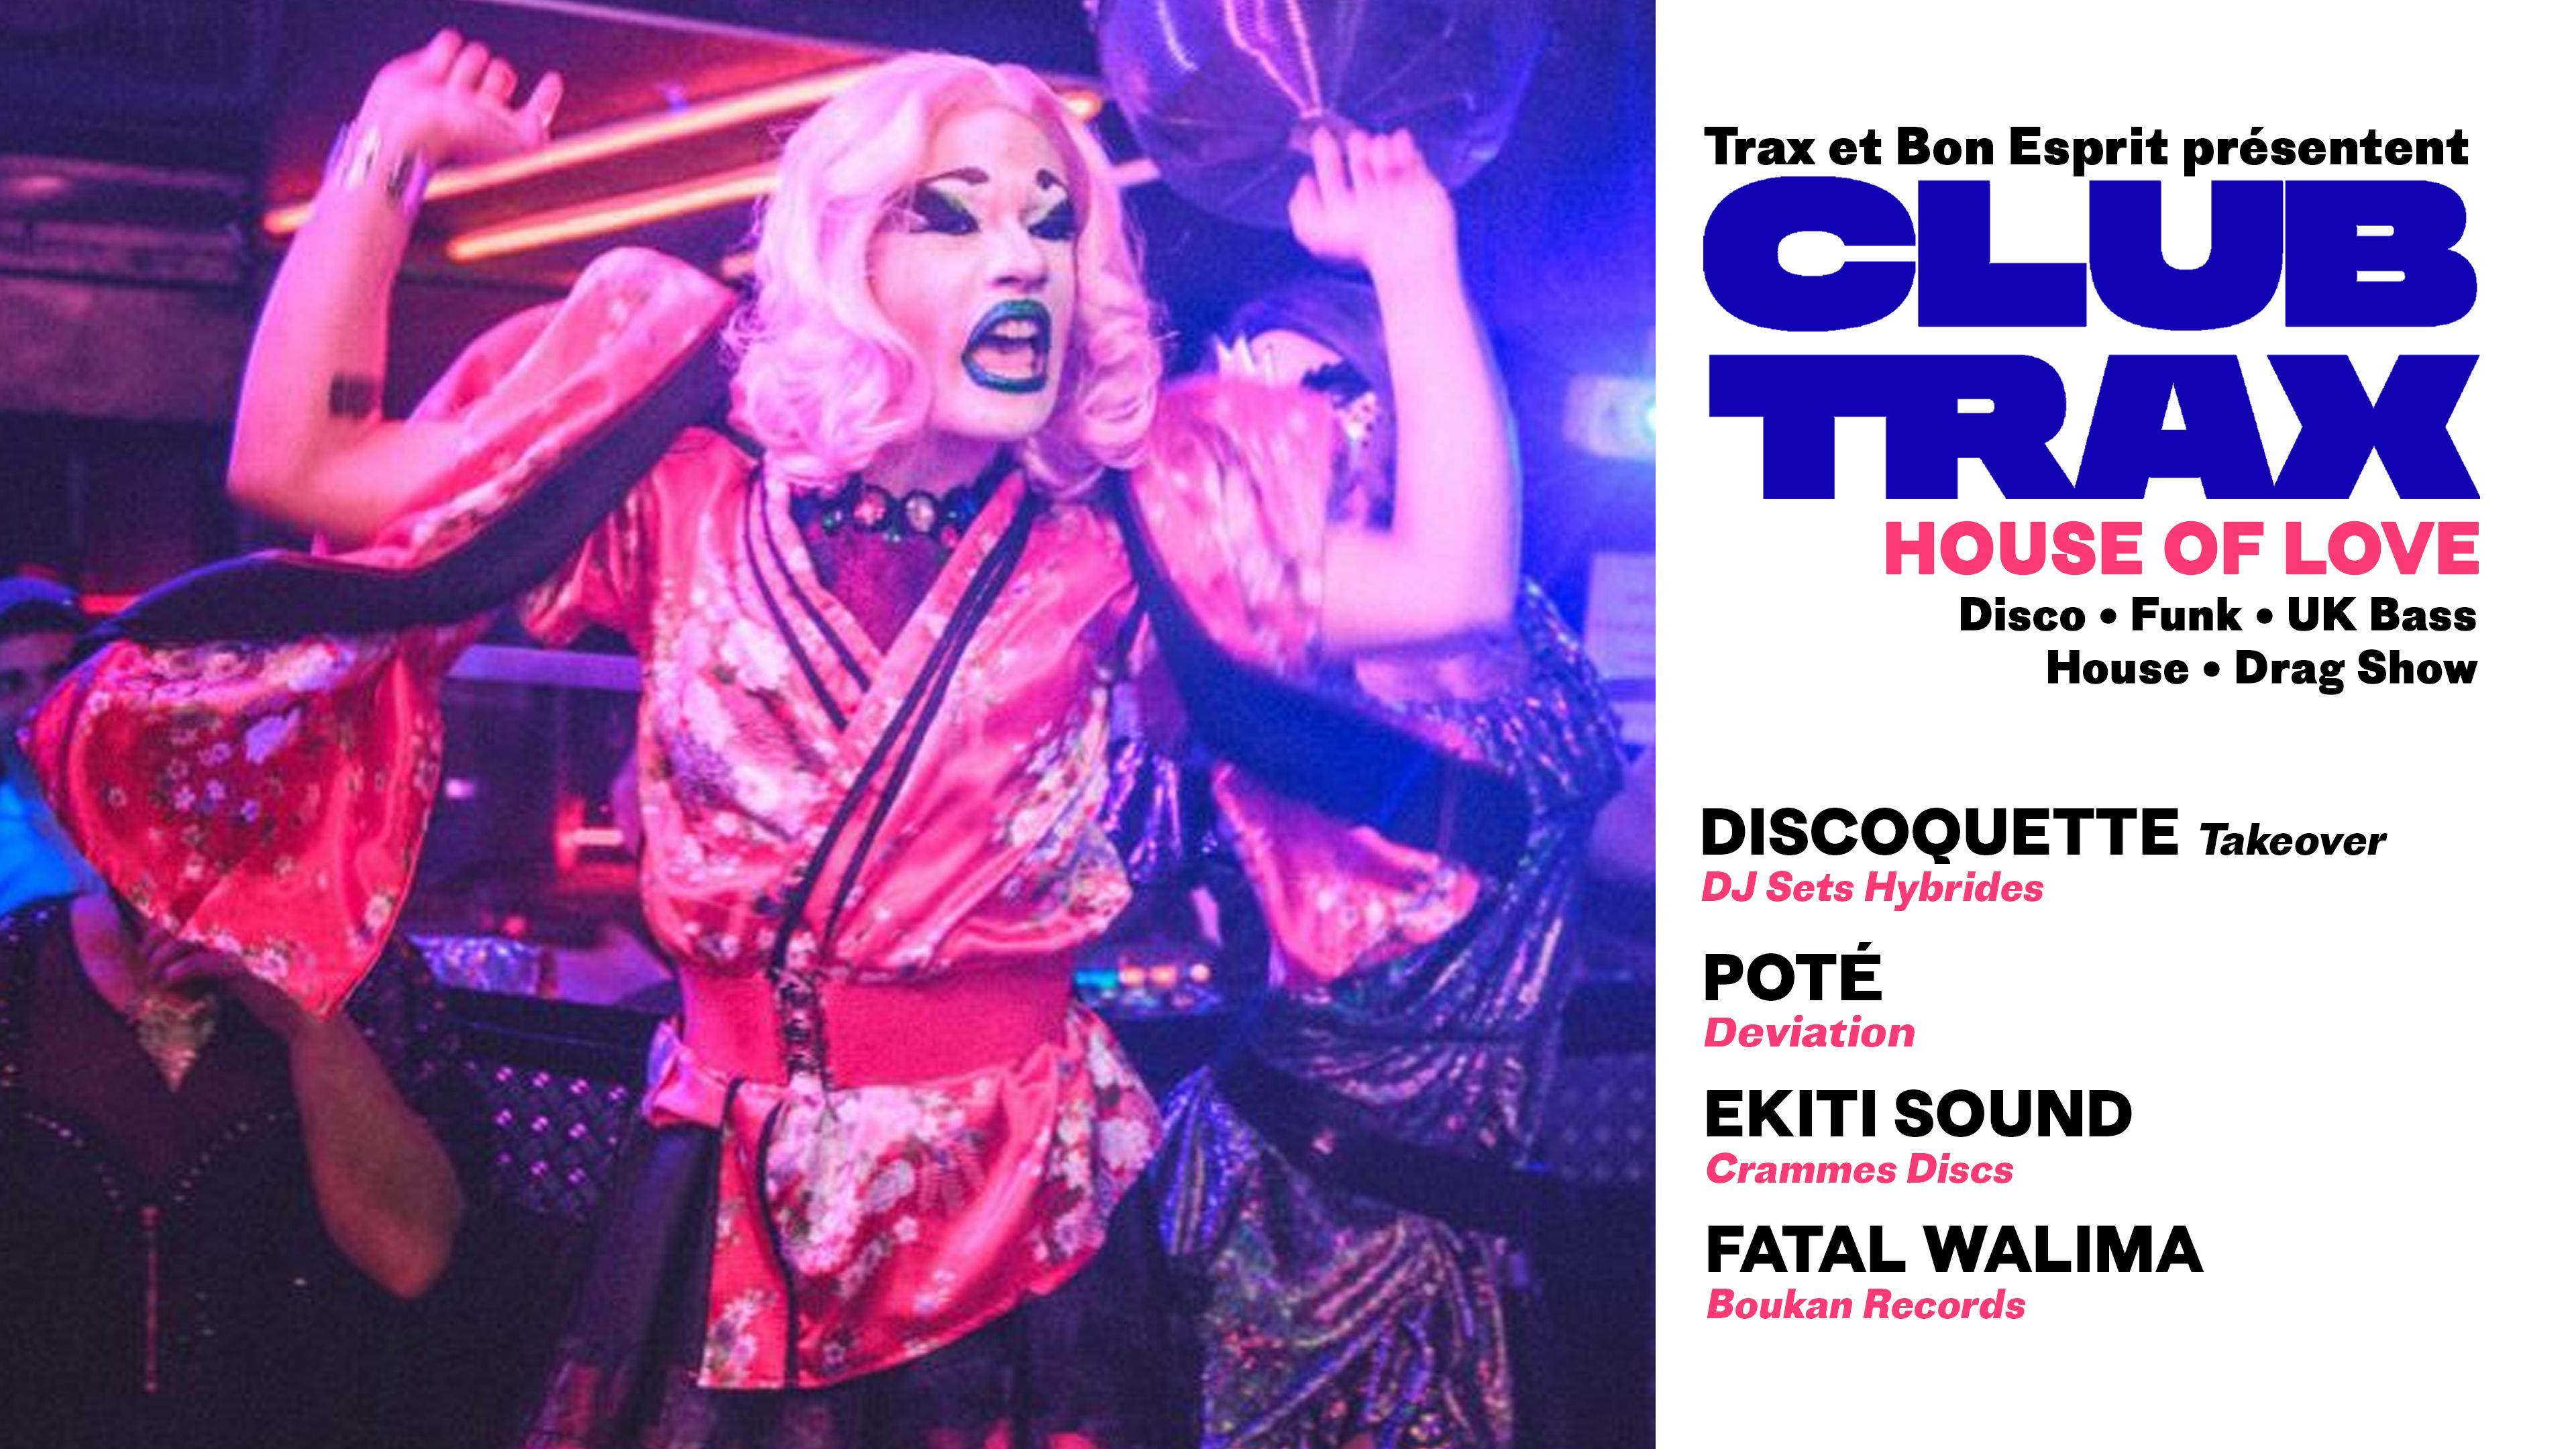 Club Trax - House of Love